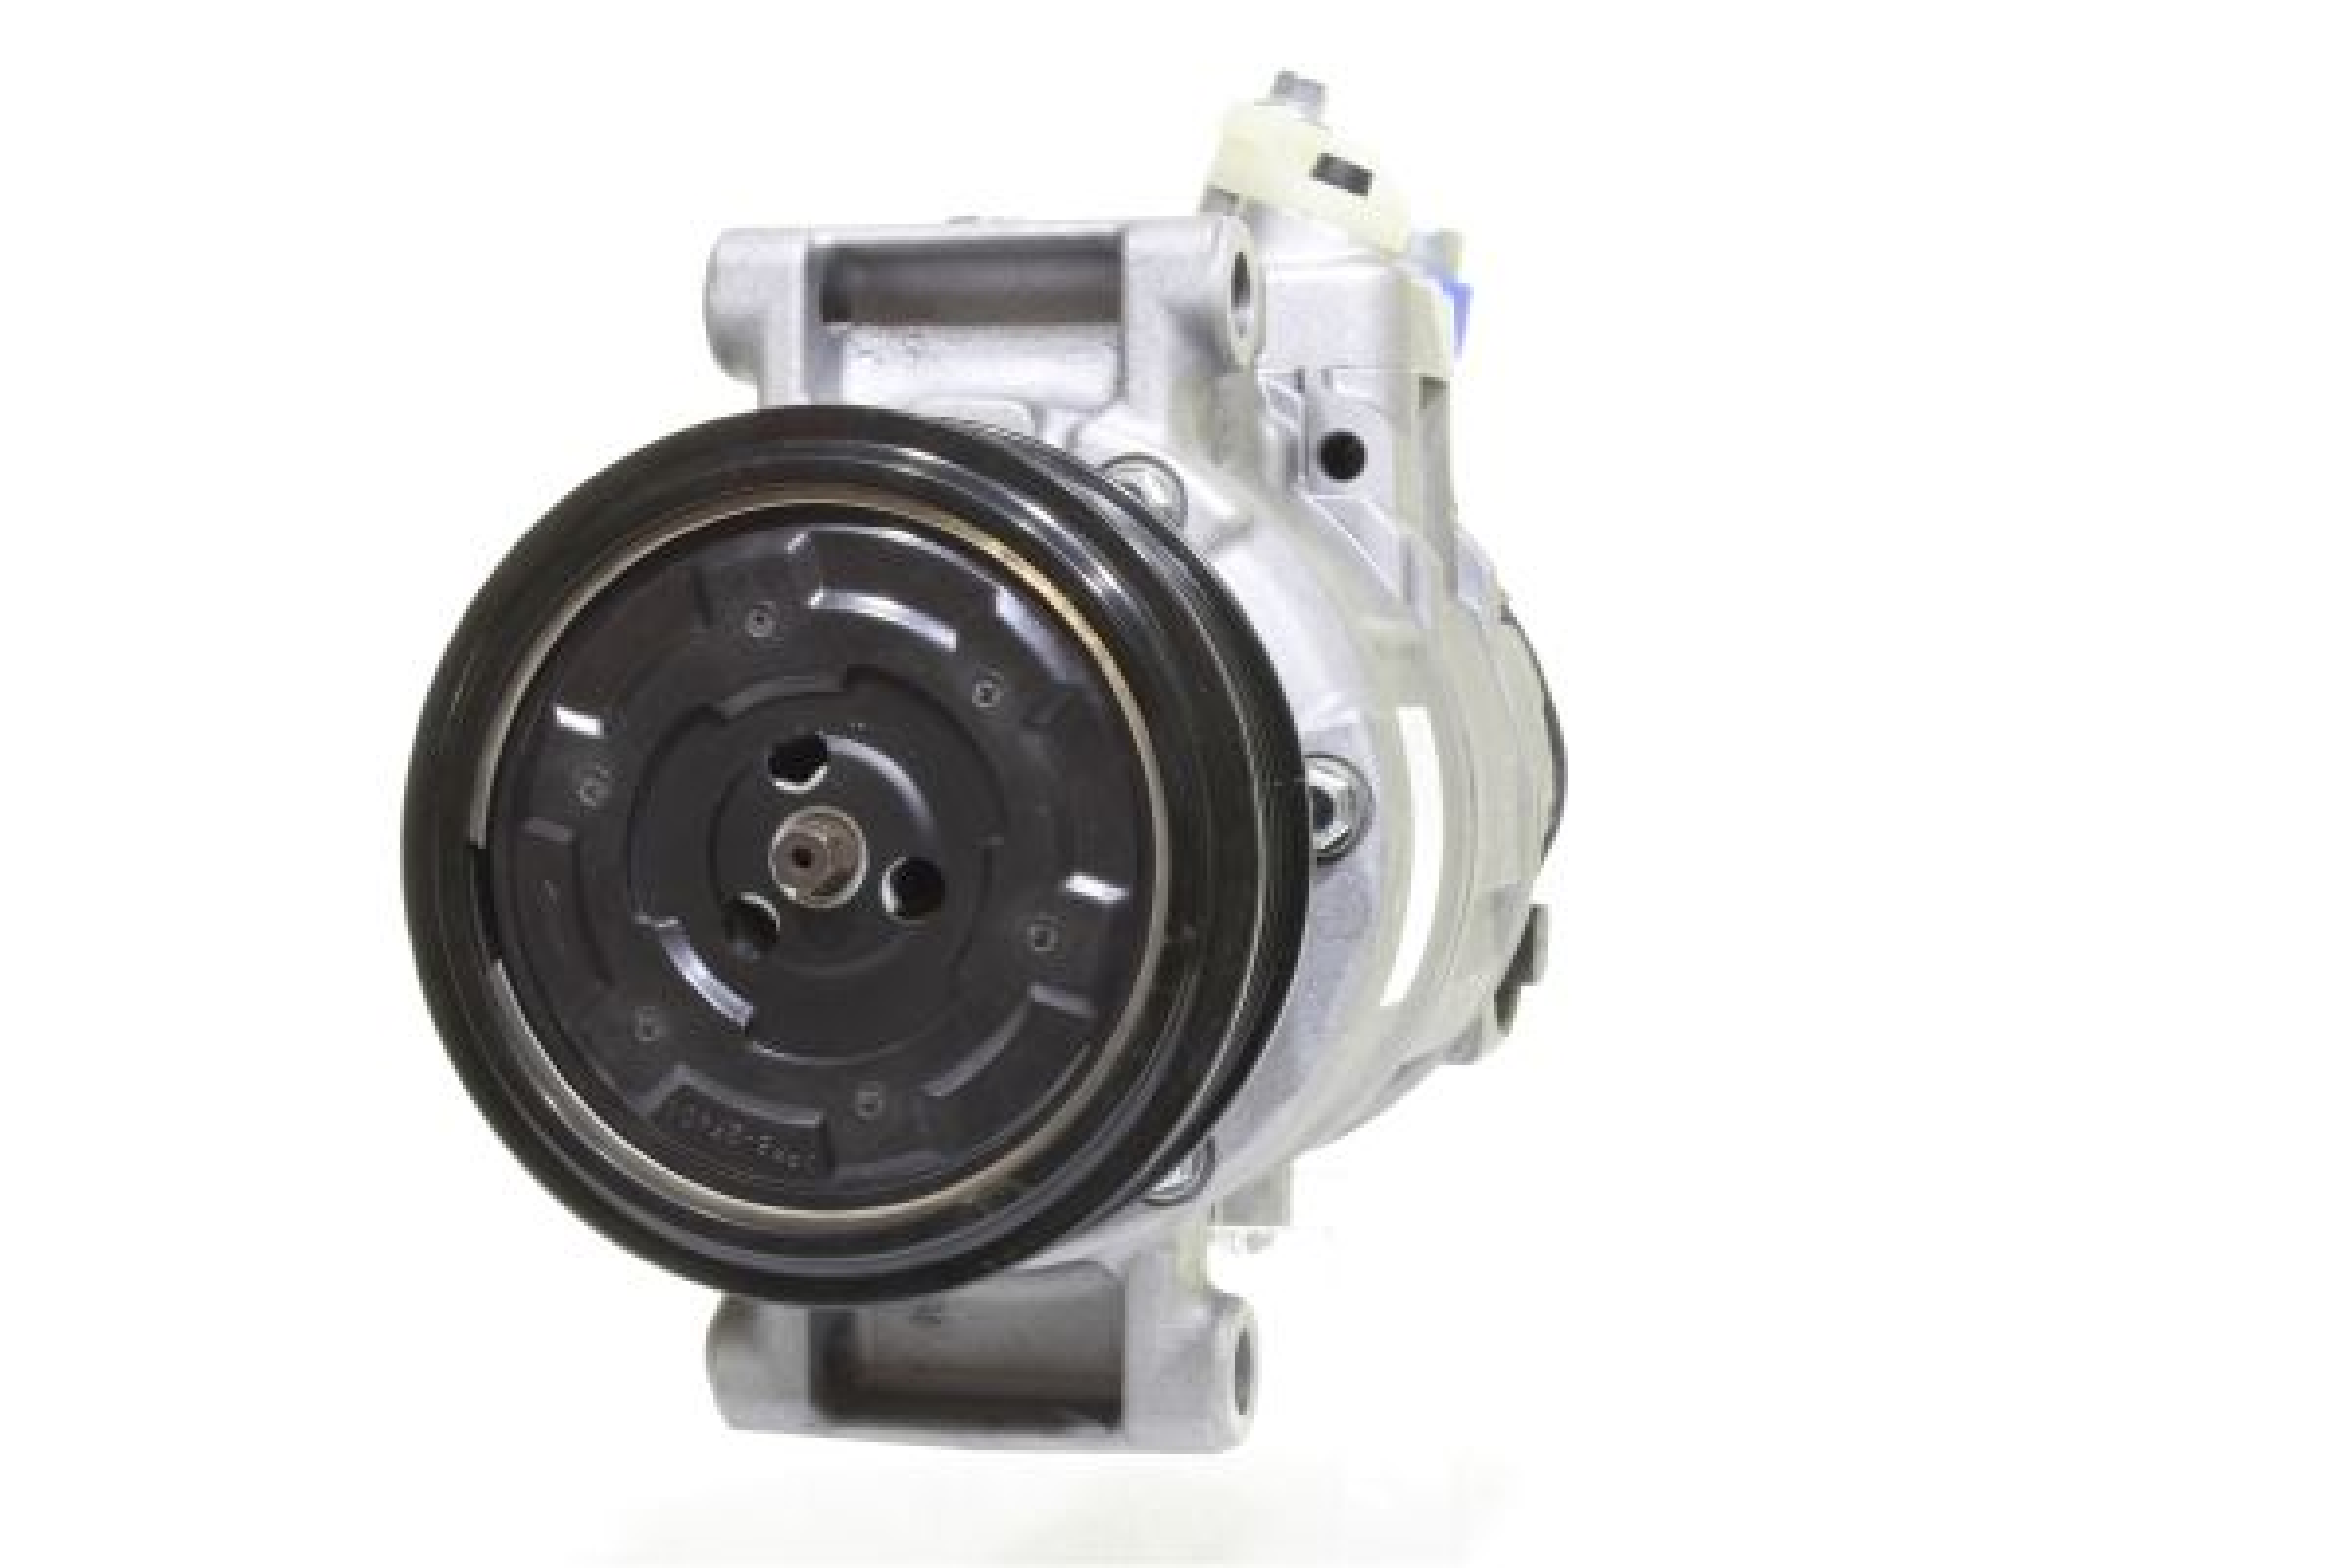 6SEU14C ALANKO PAG 46, Kältemittel: R 134a Riemenscheiben-Ø: 100mm Klimakompressor 10550934 günstig kaufen